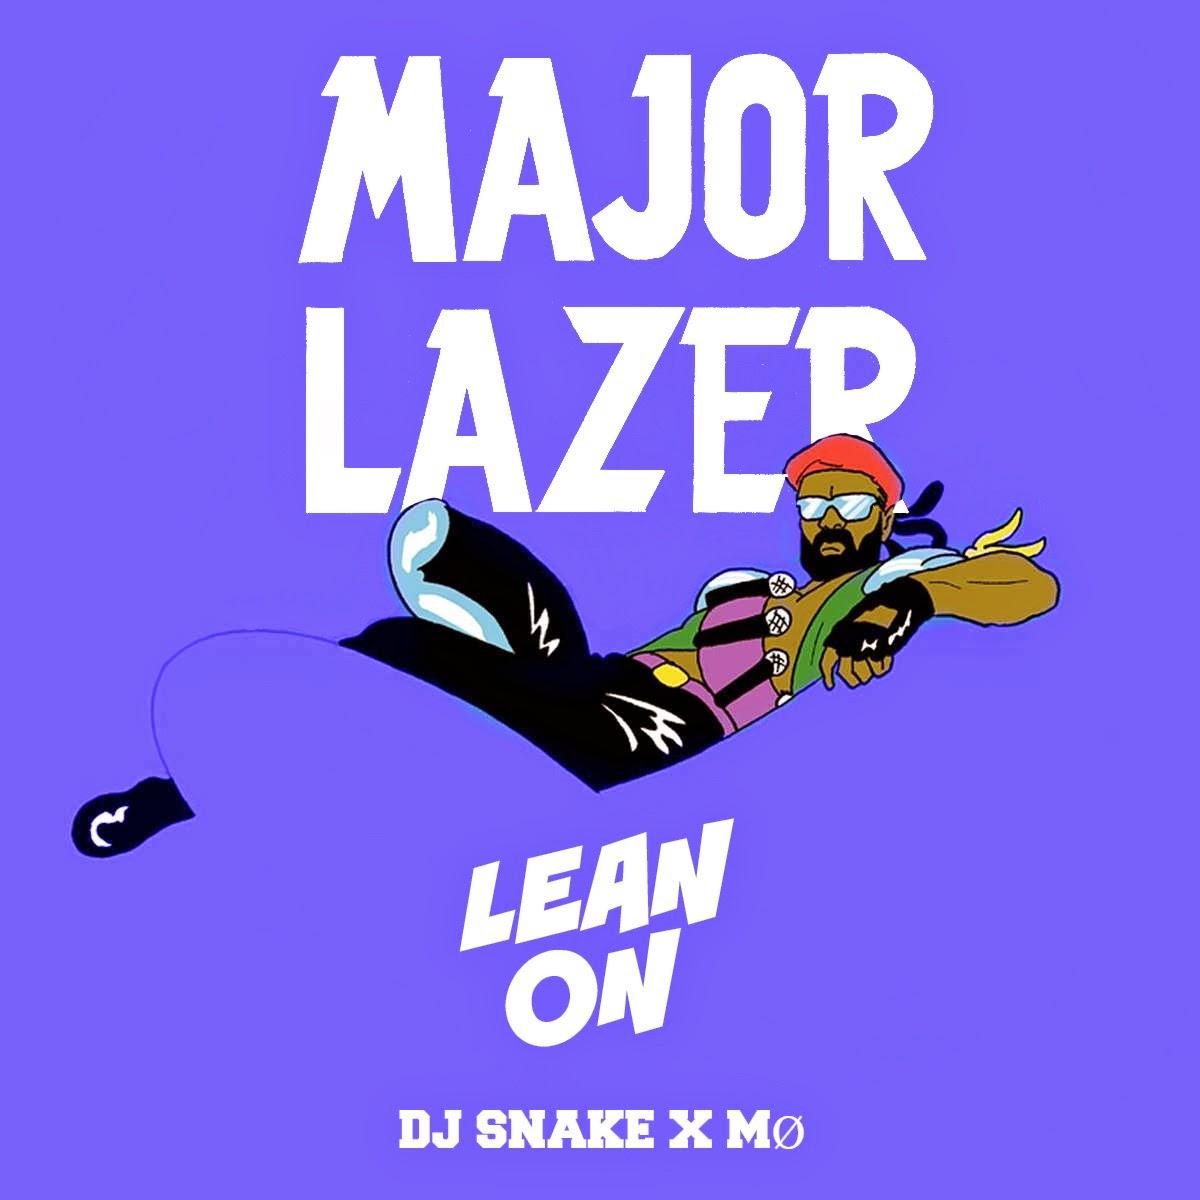 822567868_Major_Lazer_y_DJ_Snake_Ft._M_J_Balvin_Farruko_122_594lo.jpg